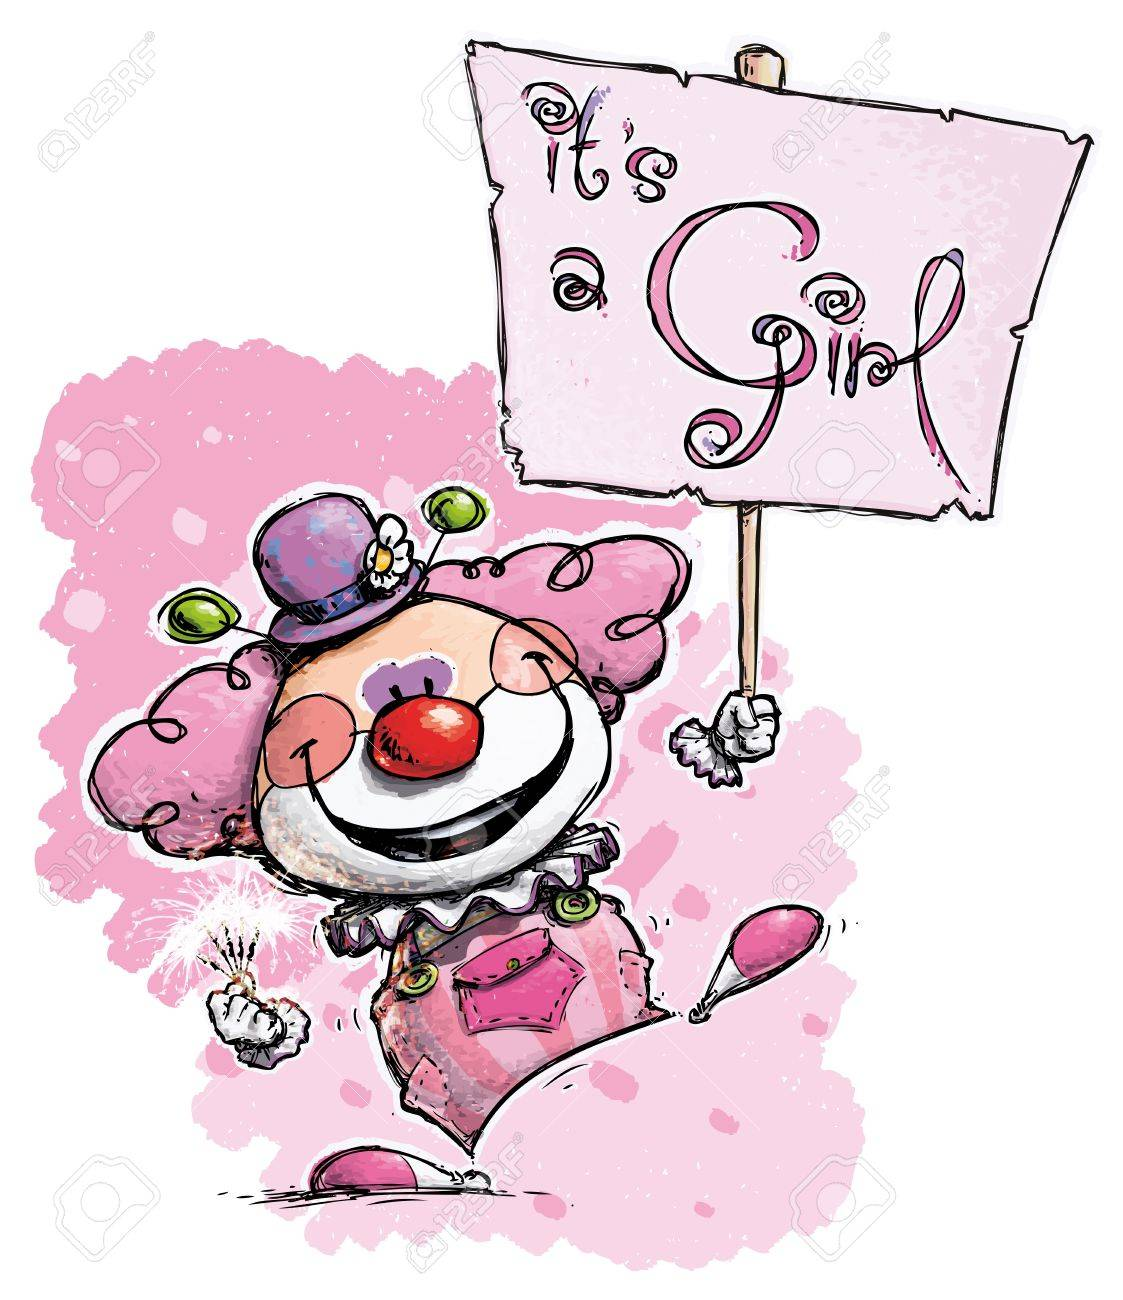 Cartoon Artistic illustration of a Clown Hoding an It Stock Vector - 21736075